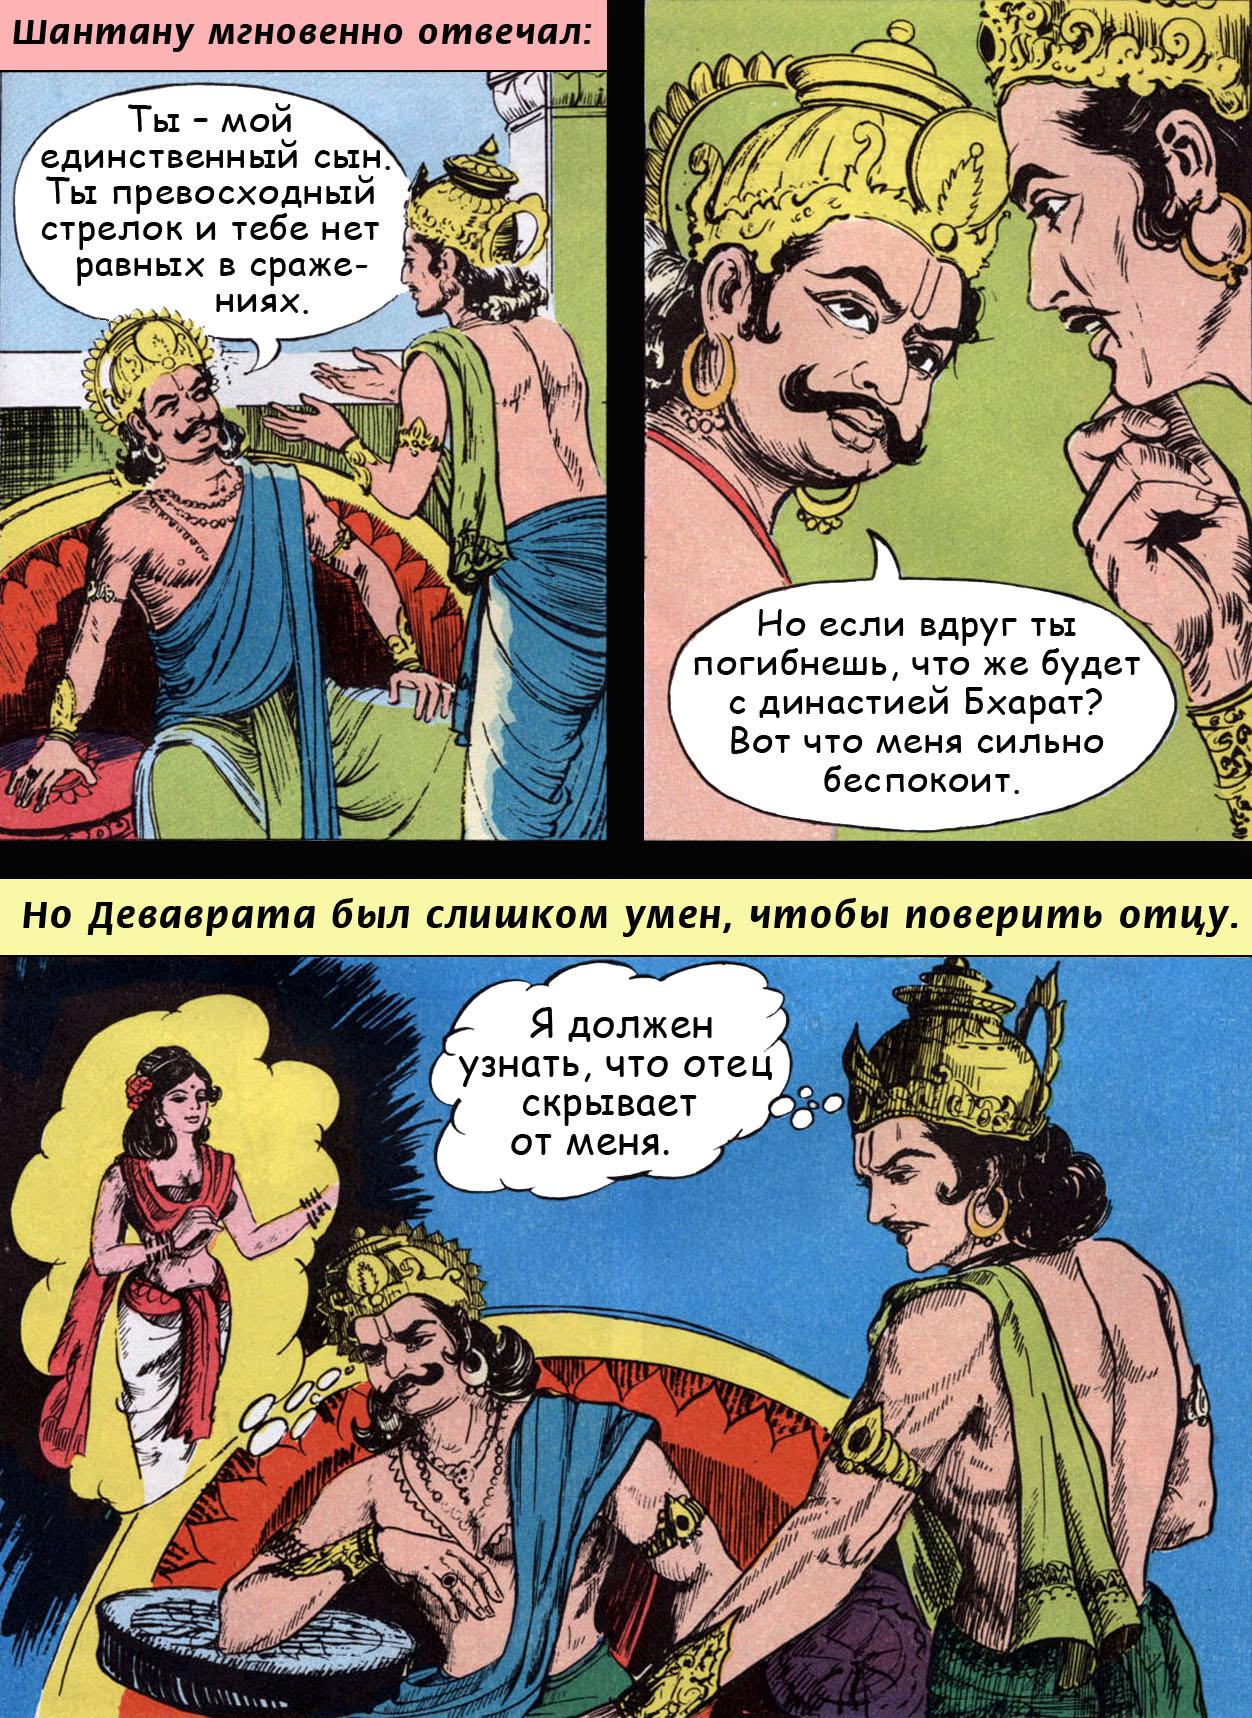 Бхишма 15 - ведический комикс